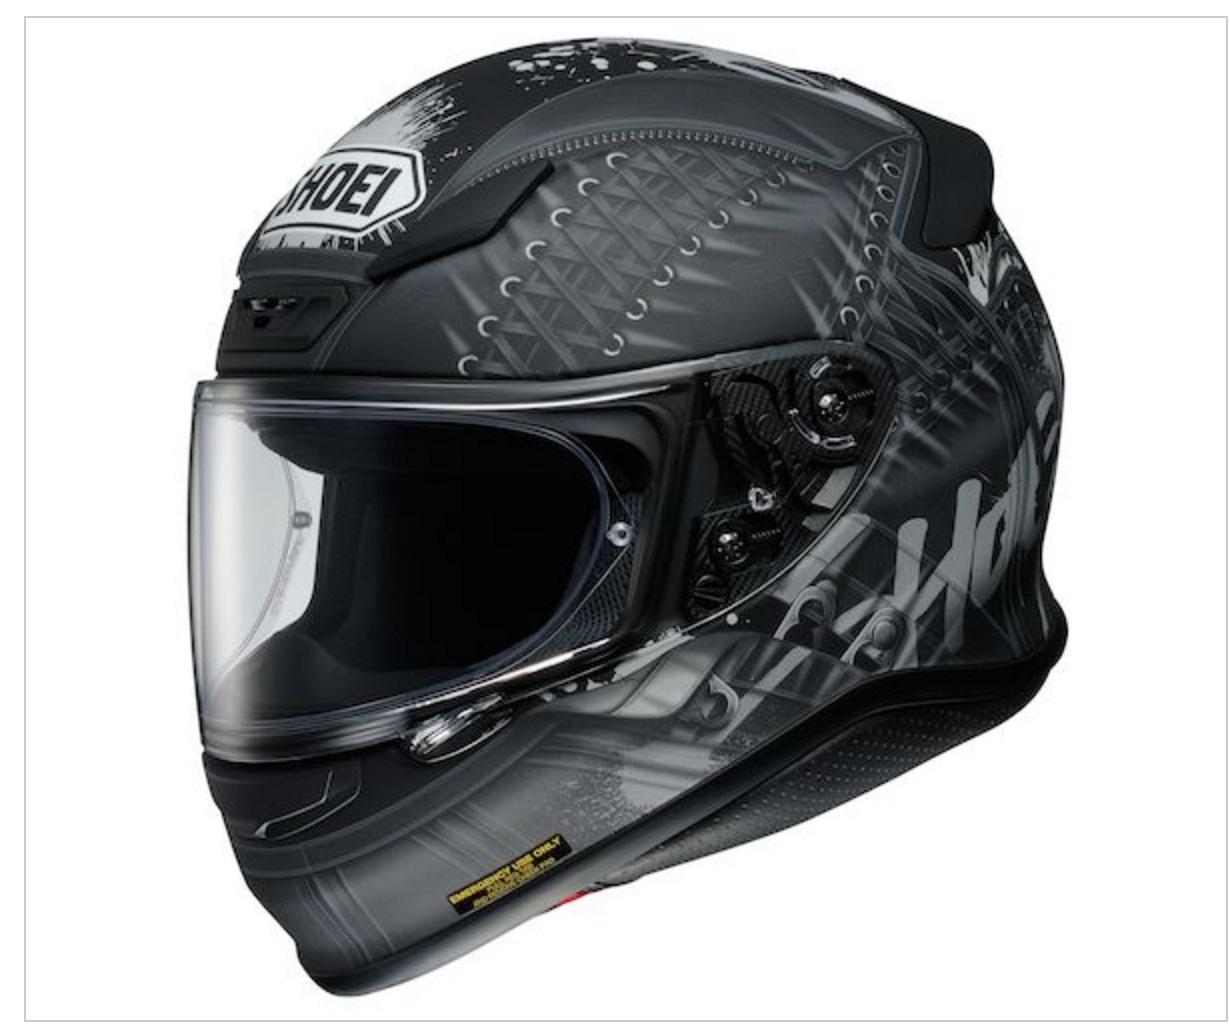 Shoei RF 1200 Seduction Helmet